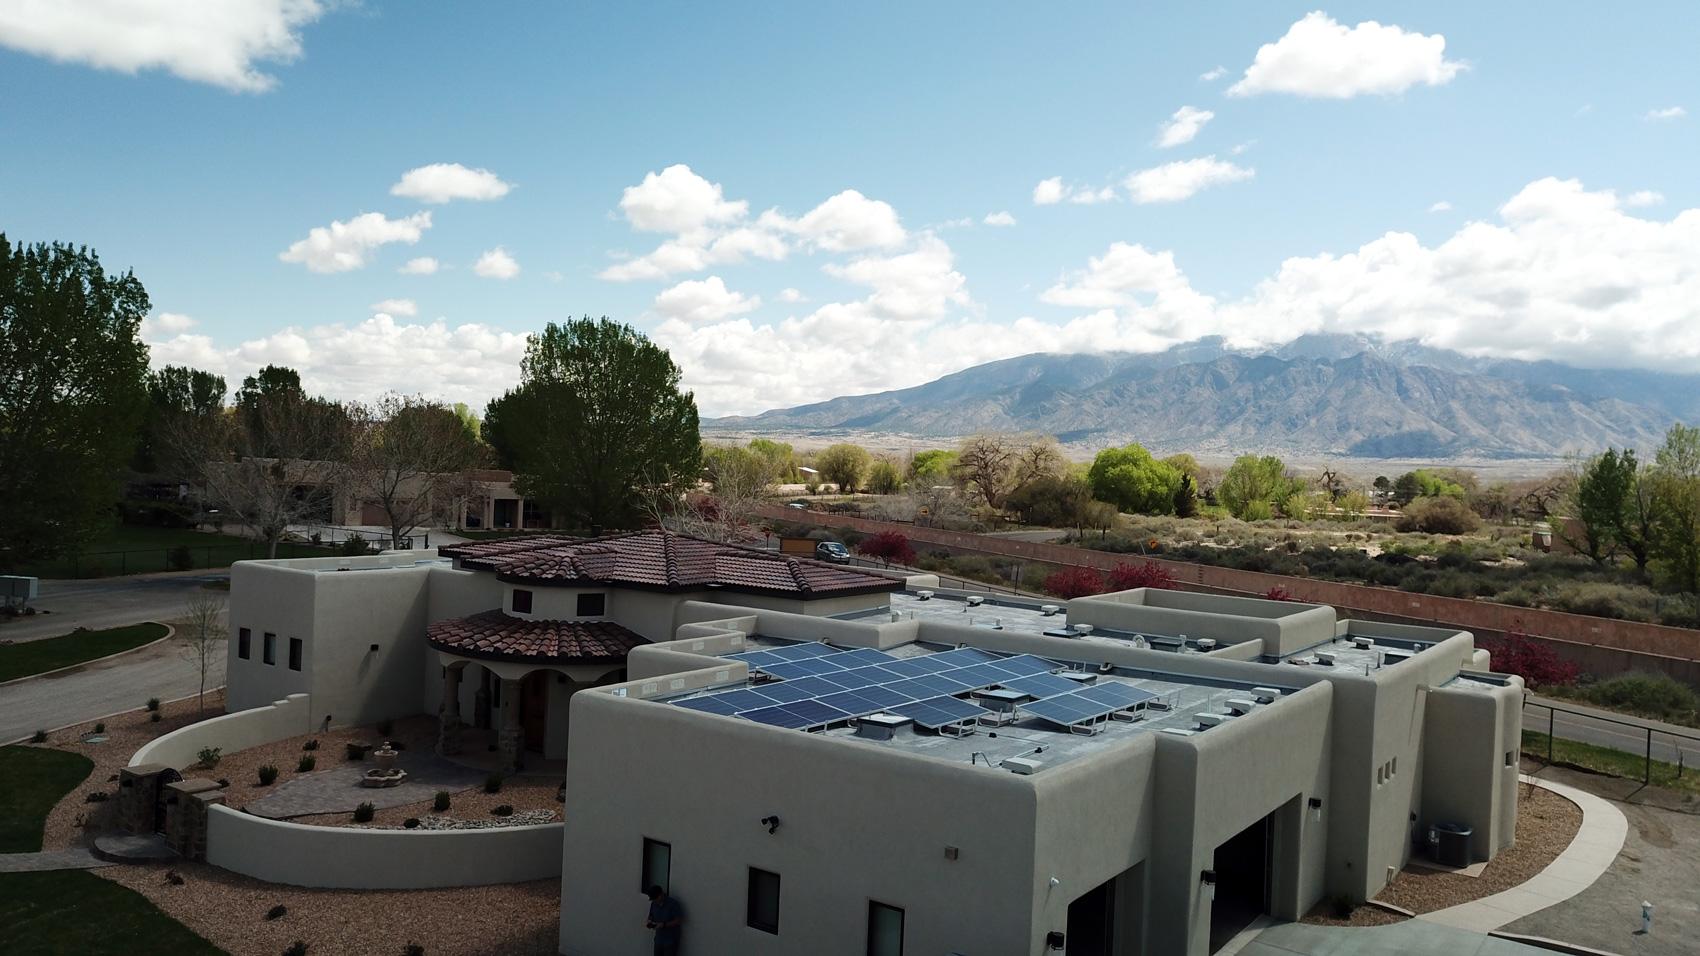 Albuquerque Solar Installation, residential